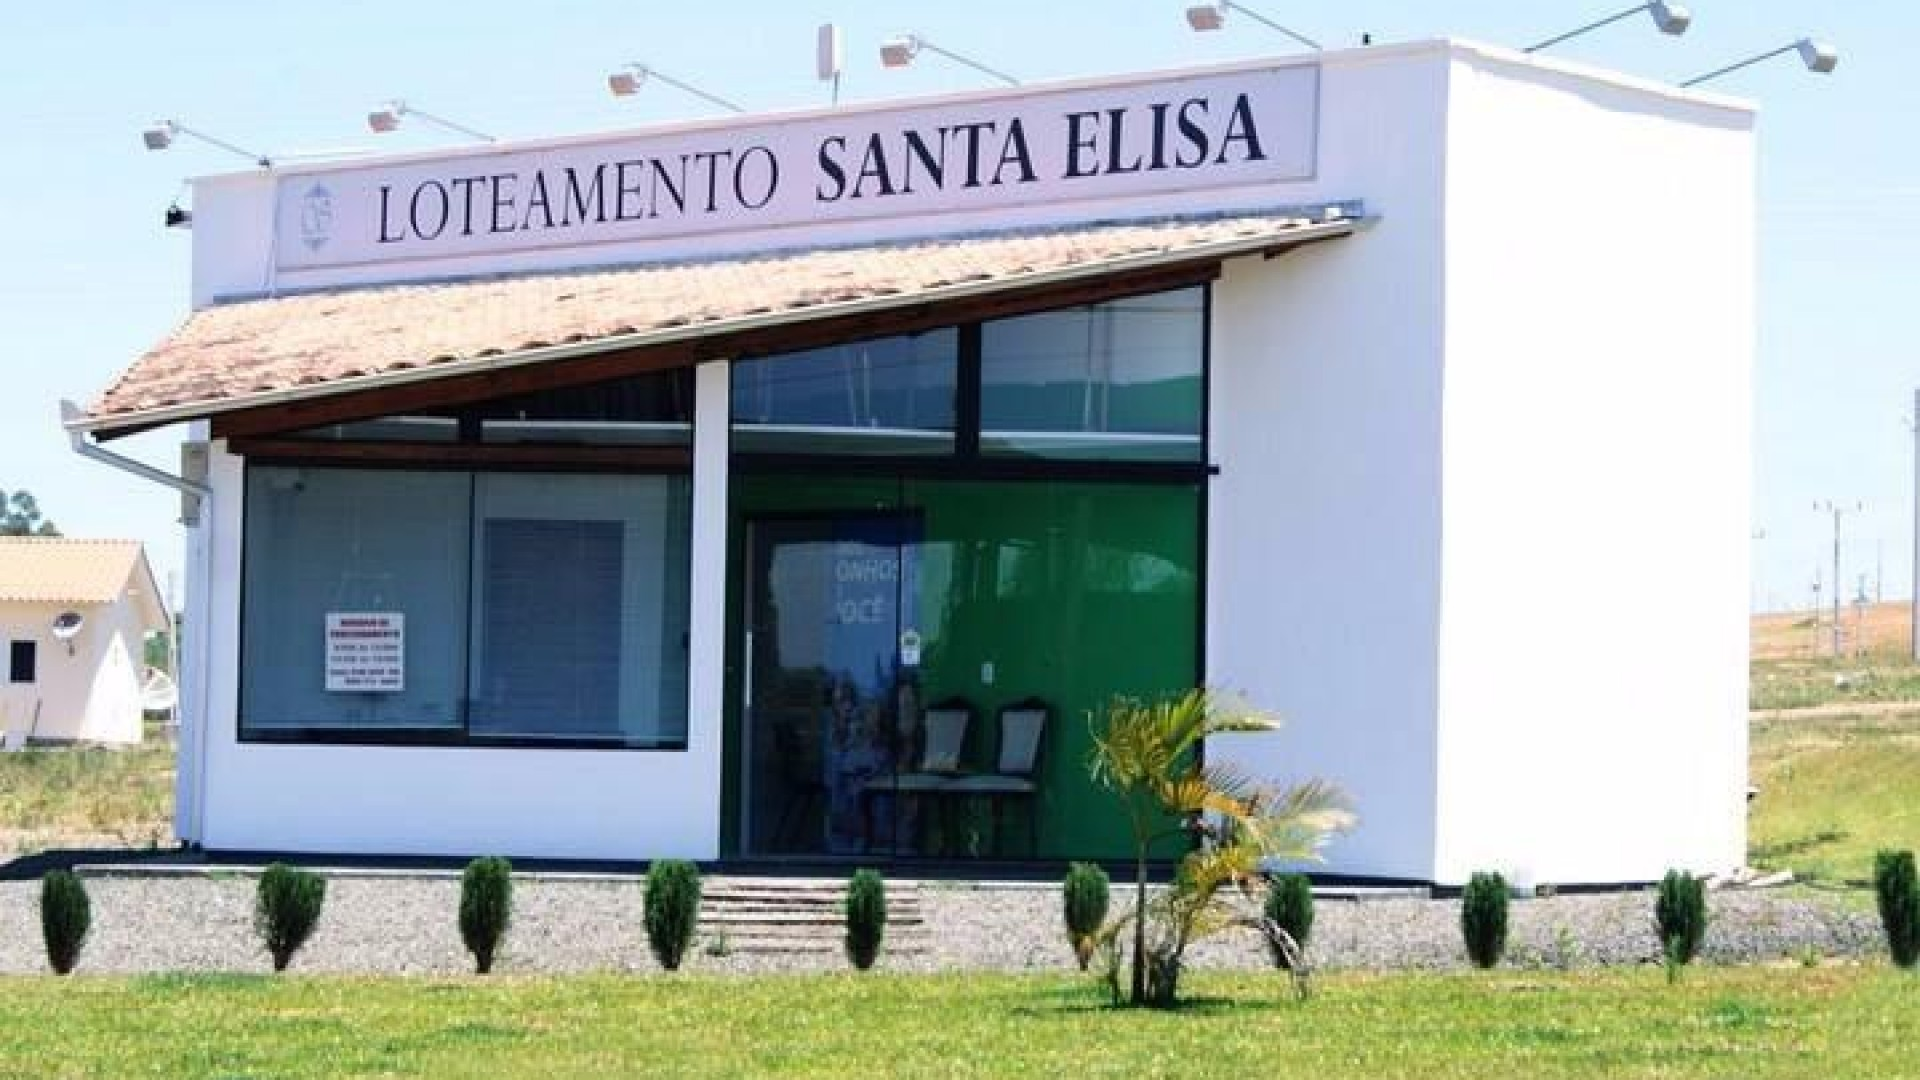 Lote loteamento Santa Elisa - Içara/SC